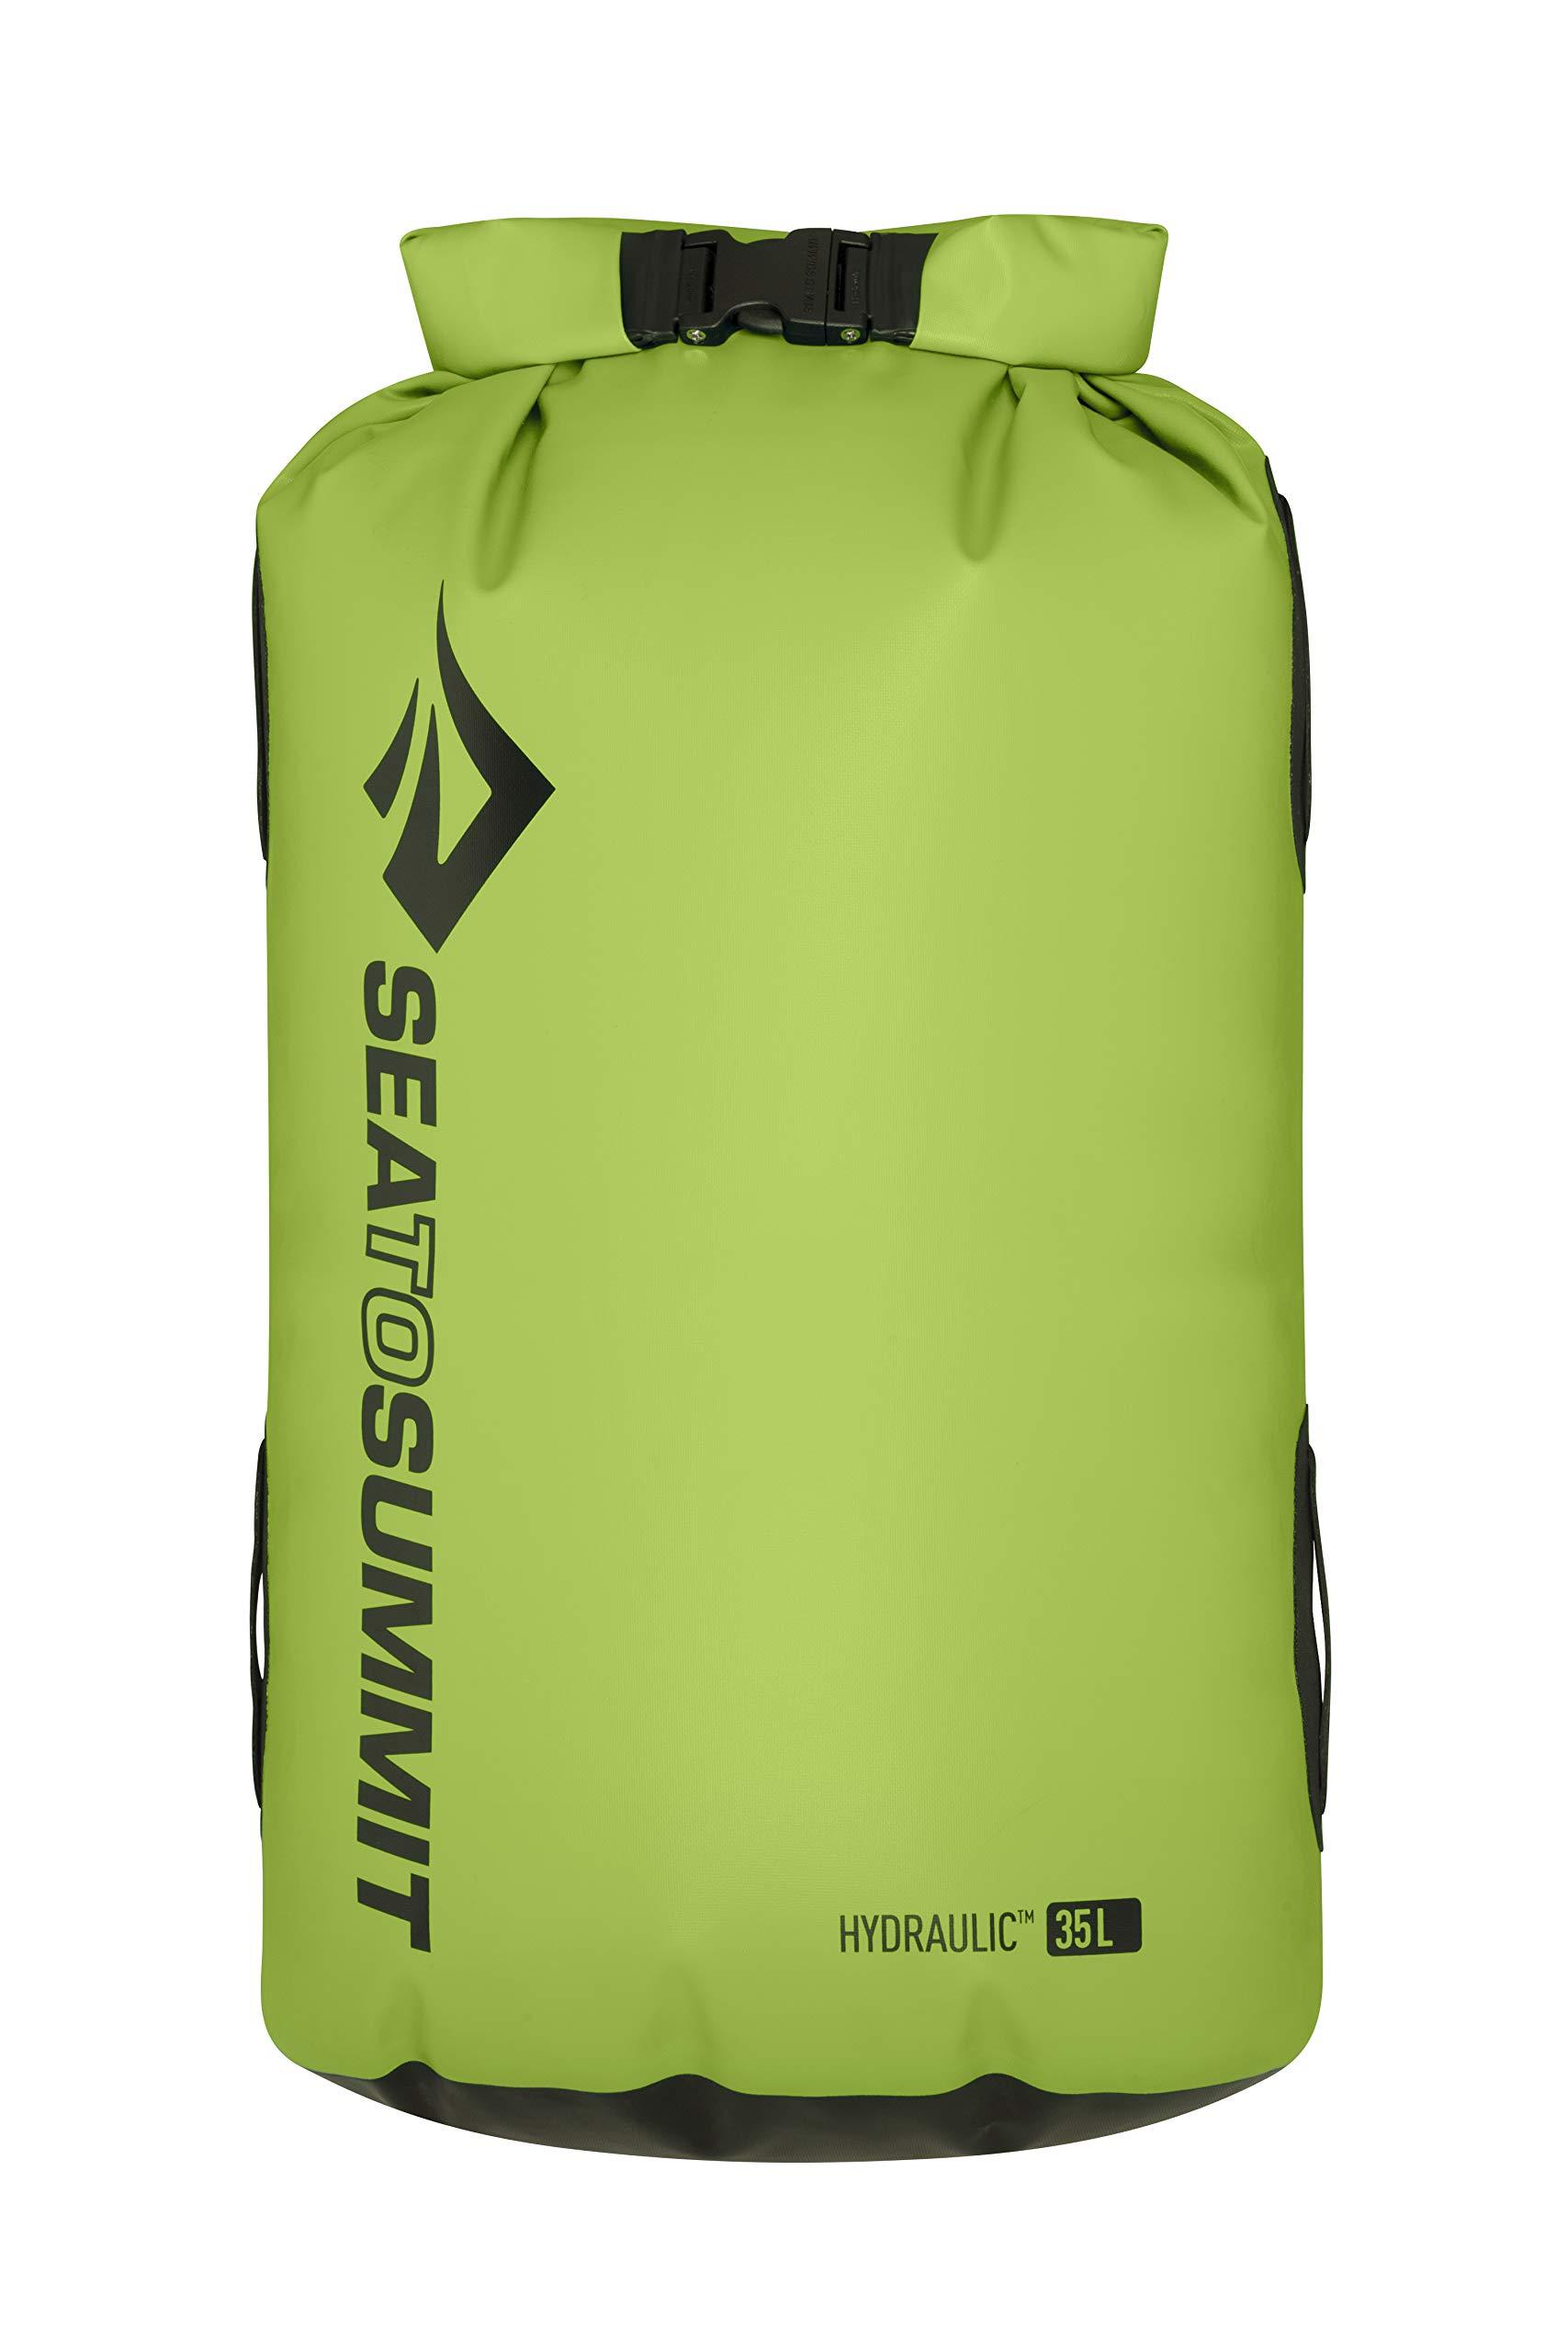 Sea to Summit Hydraulic Dry Bag - Green 35L by Sea to Summit